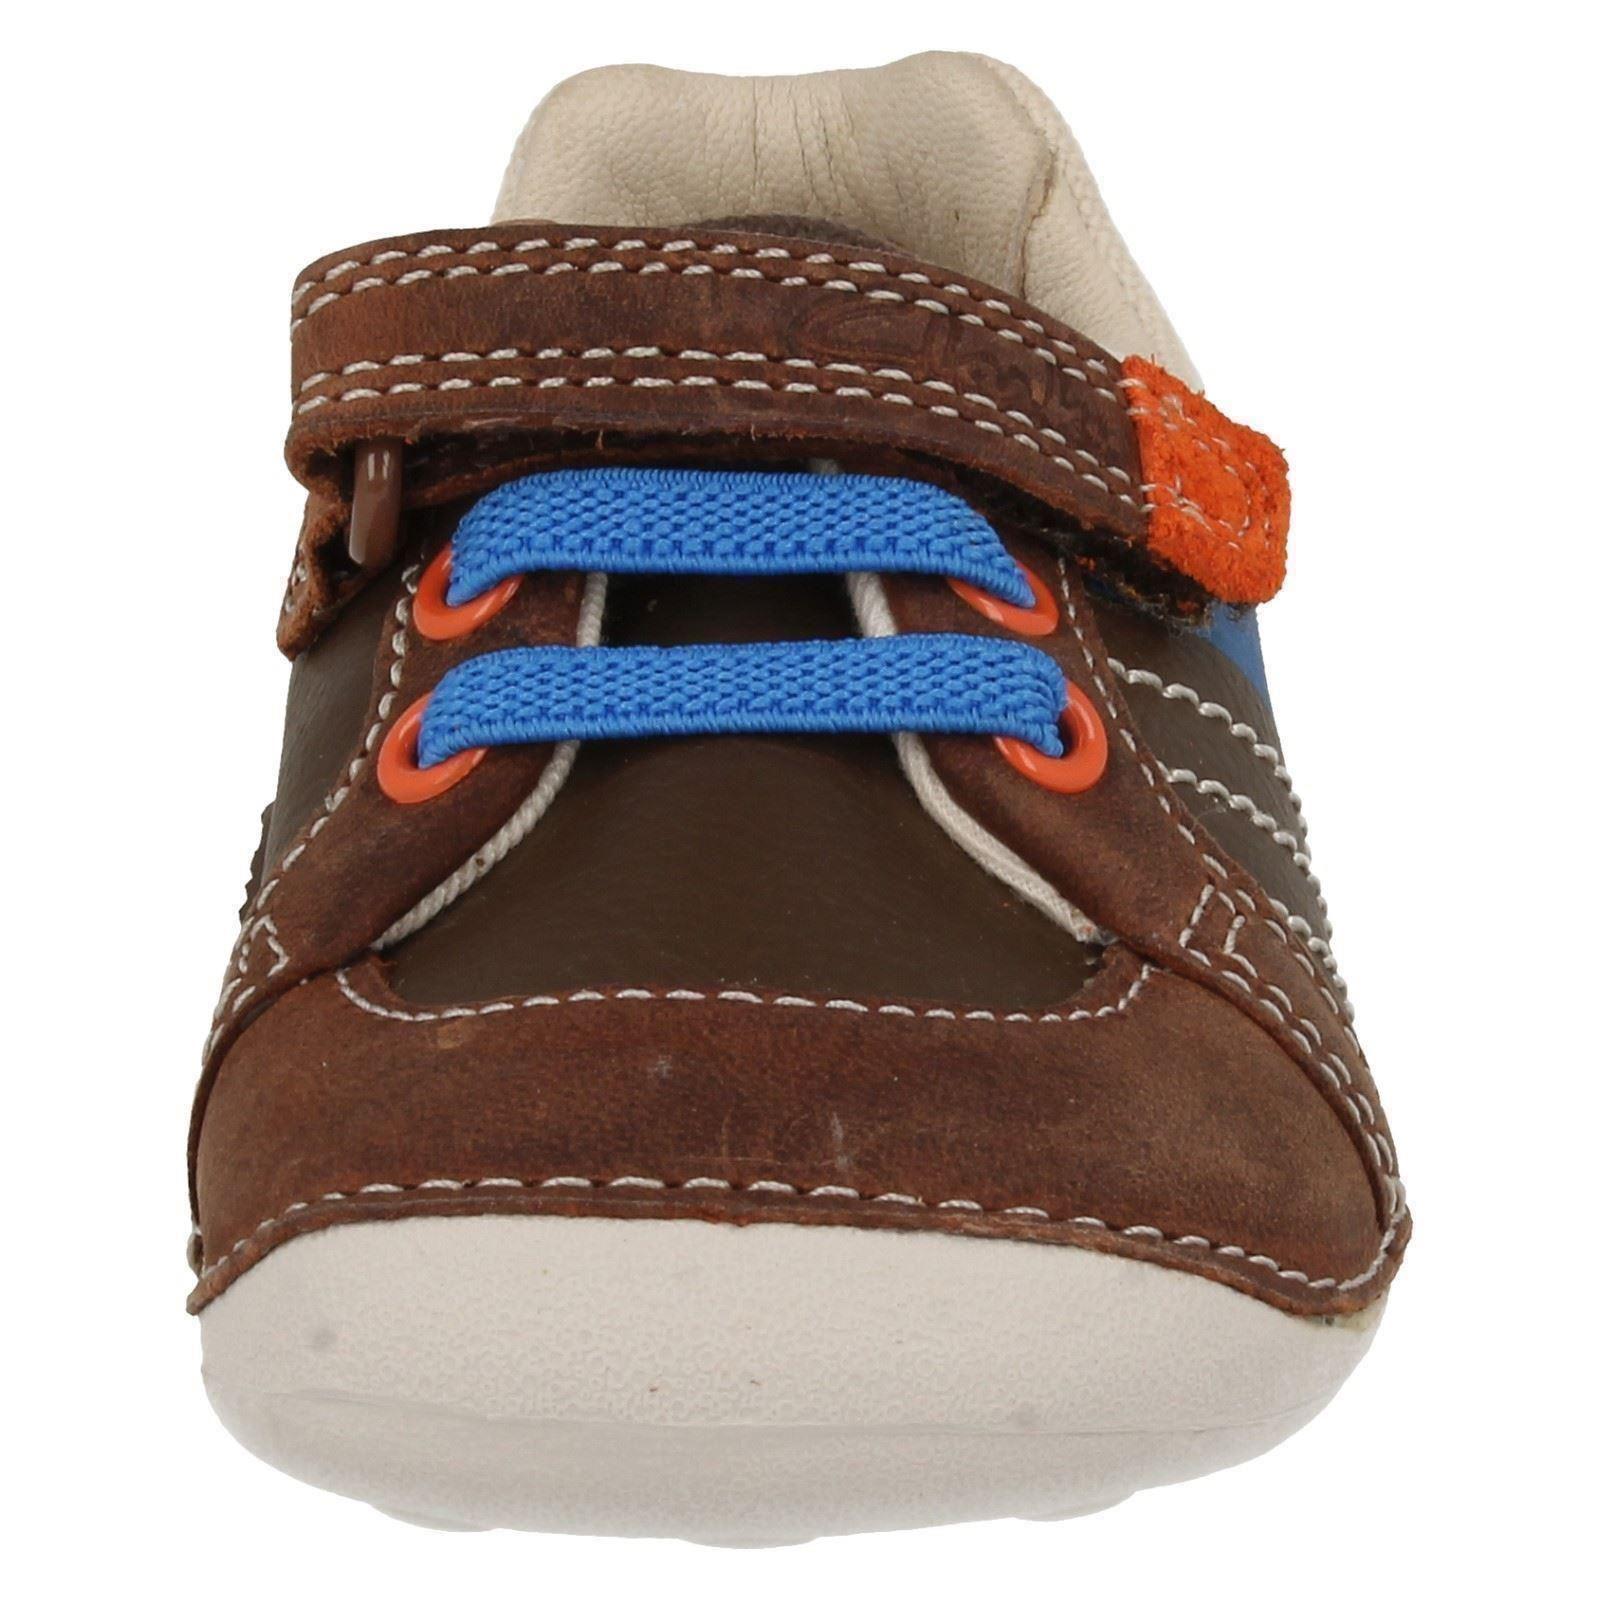 Boys Clarks Infant Shoes Label - Tiny Myle